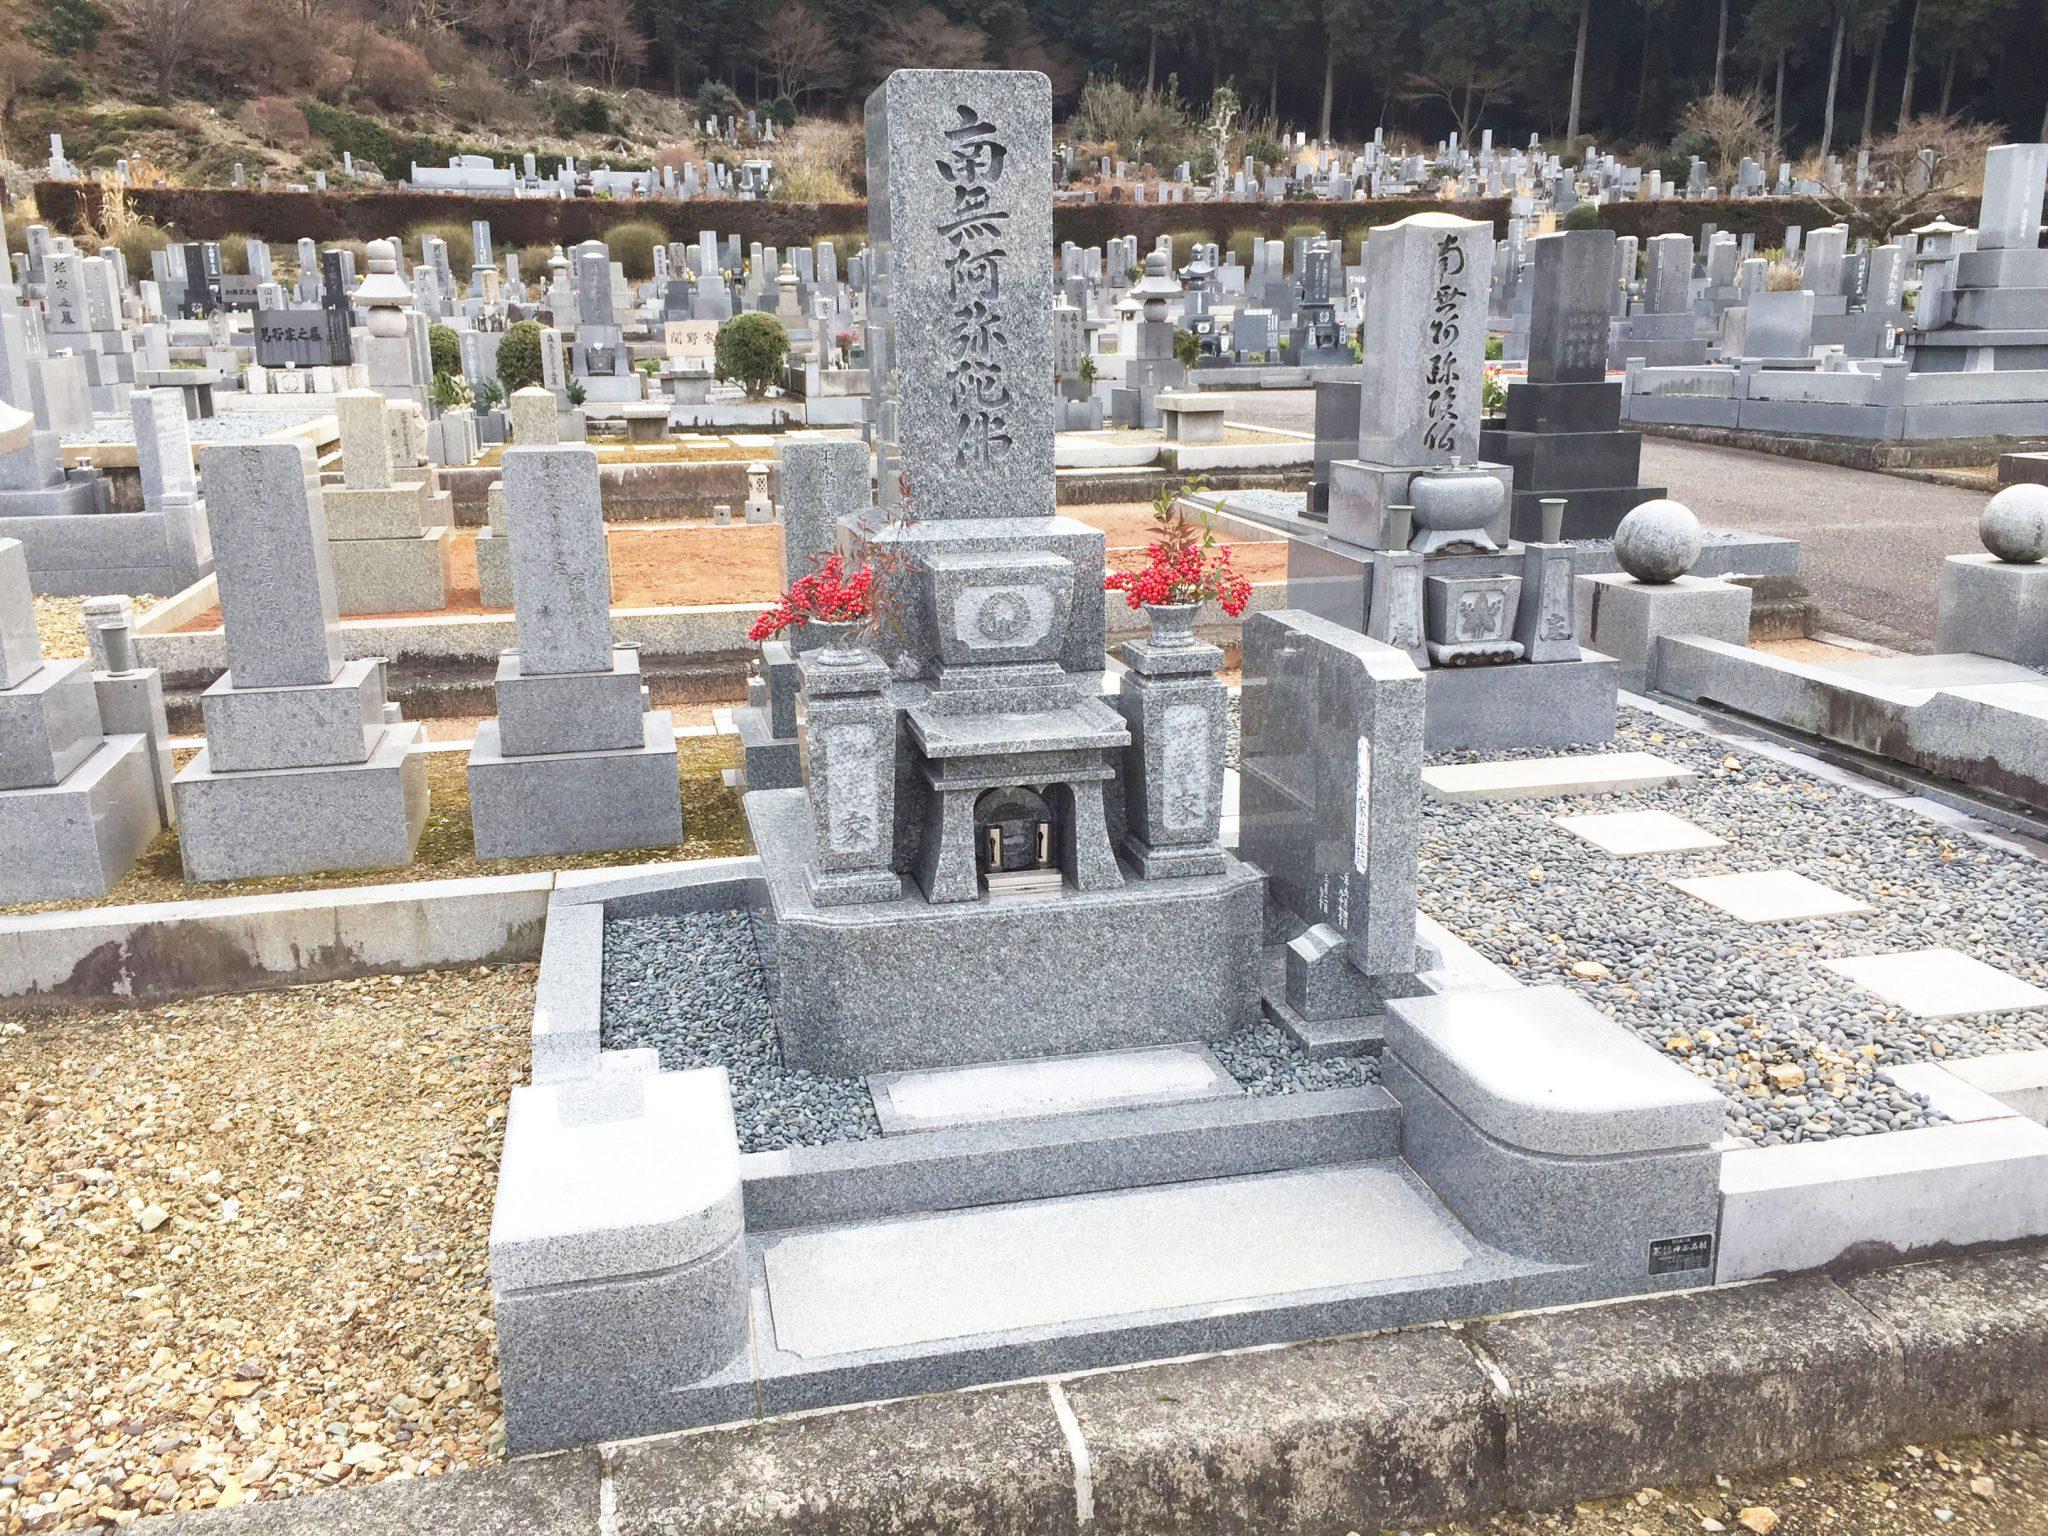 和型墓石 9寸3段 神谷石材オリジナル墓石 光明型墓石 門柱外柵